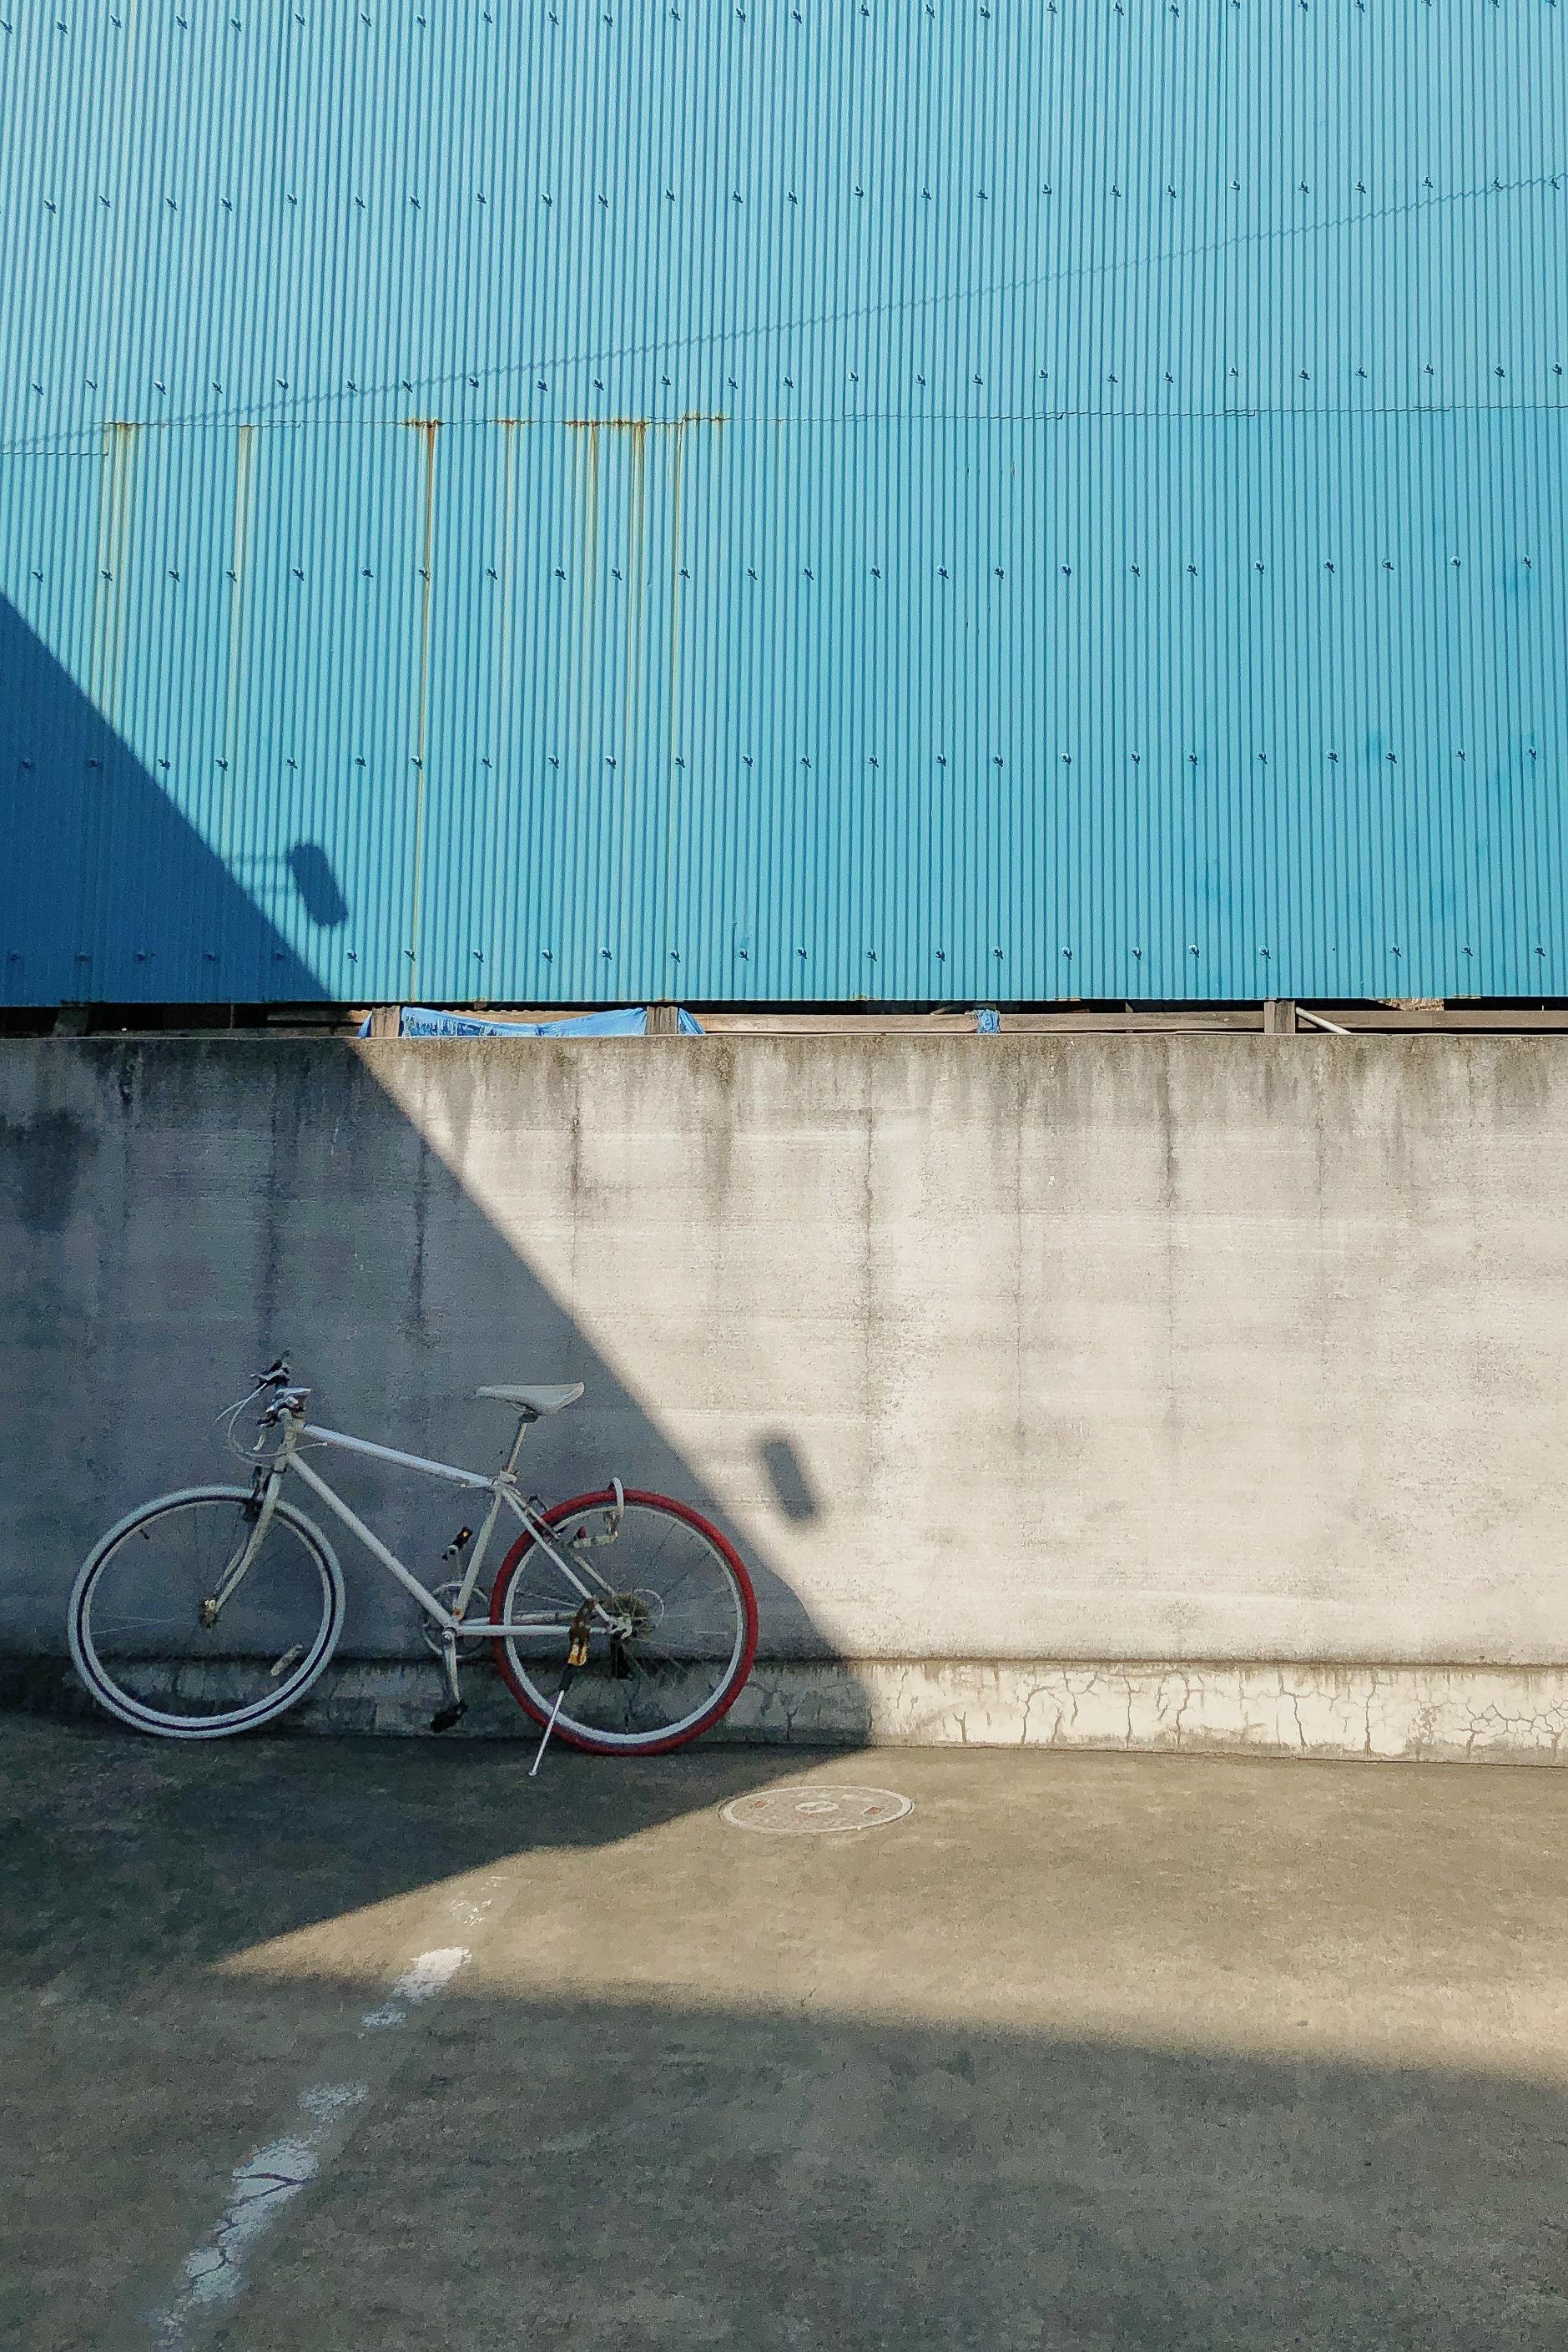 Location: Shimokita, Tokyo